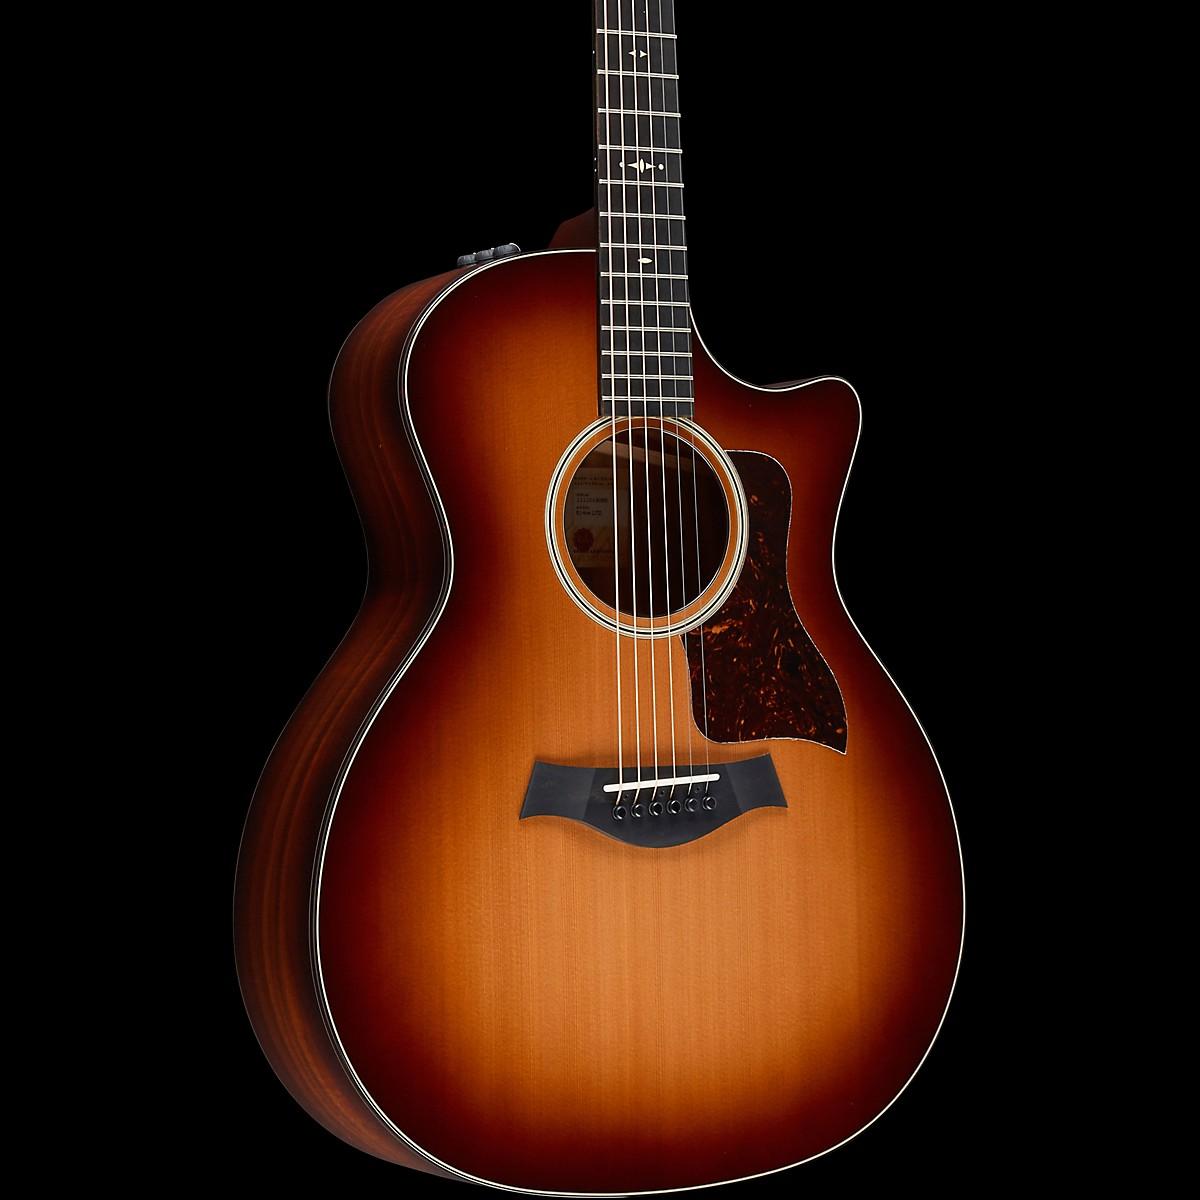 Taylor 514ce Koa Limited Edition Grand Auditorium Acoustic Electric Guitar